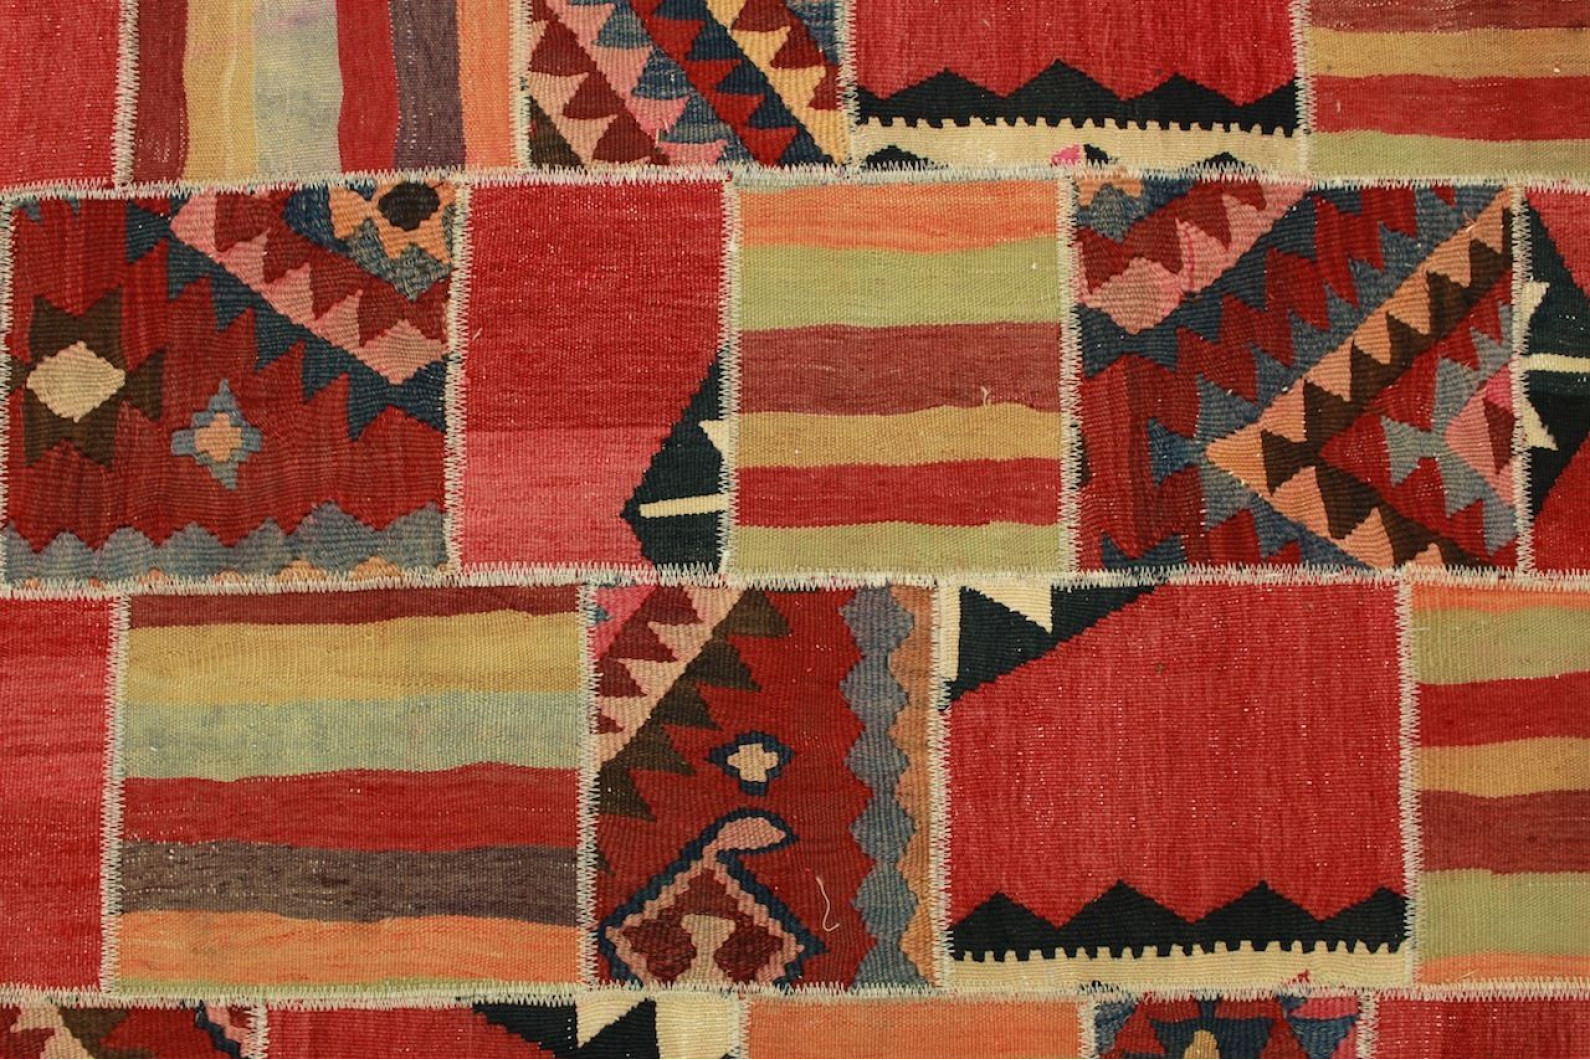 kelim patchwork teppich rot in 200x150cm 1001 2131 bei. Black Bedroom Furniture Sets. Home Design Ideas